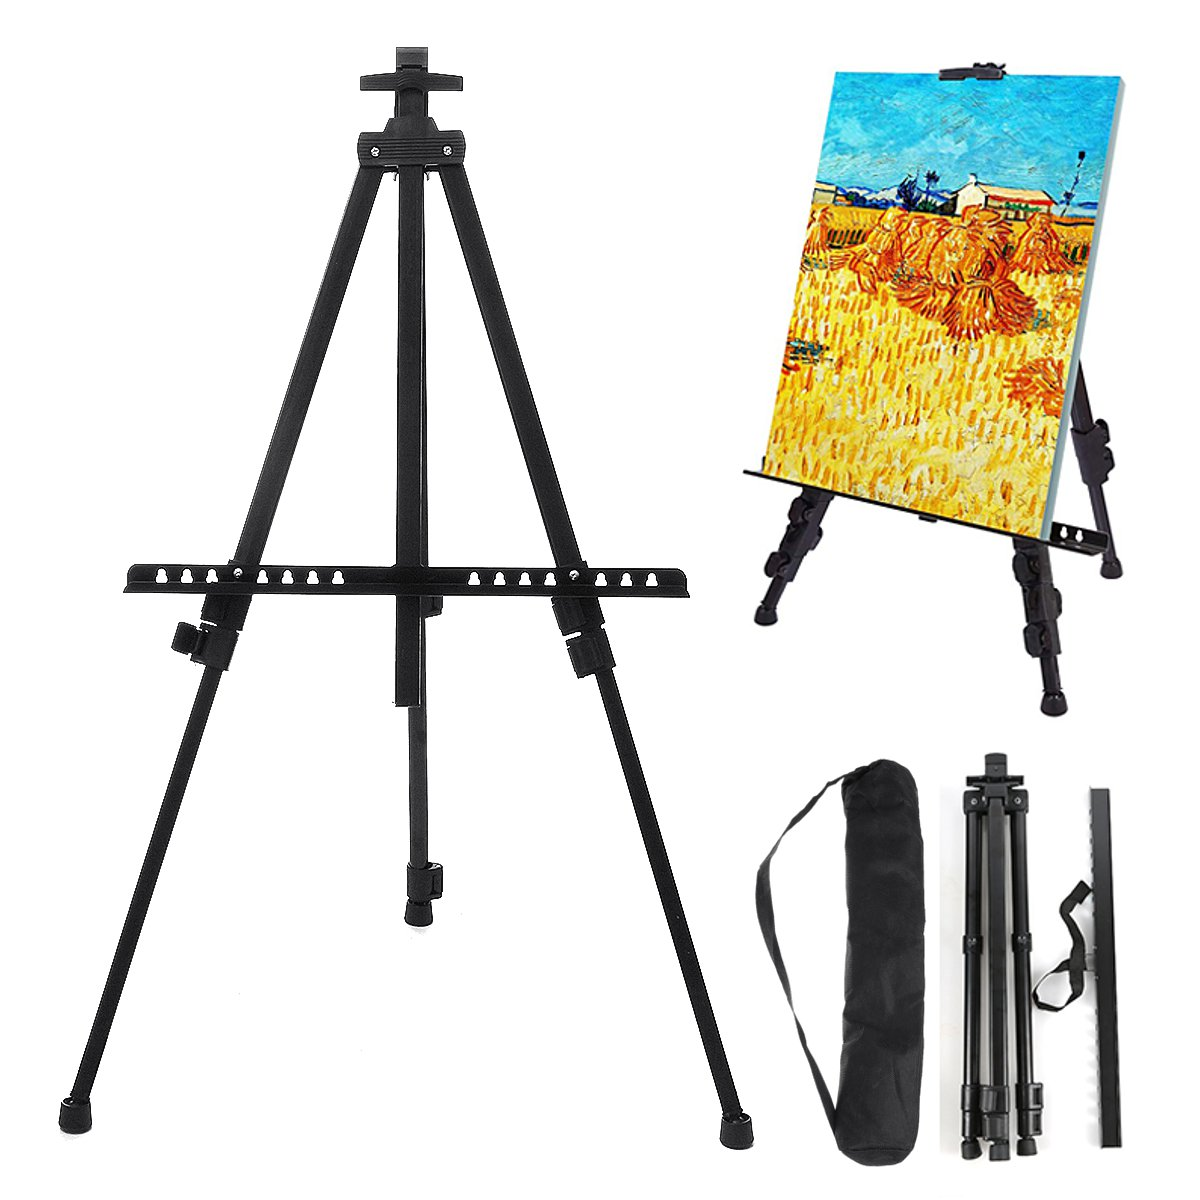 Adjustable Iron Painting Display…